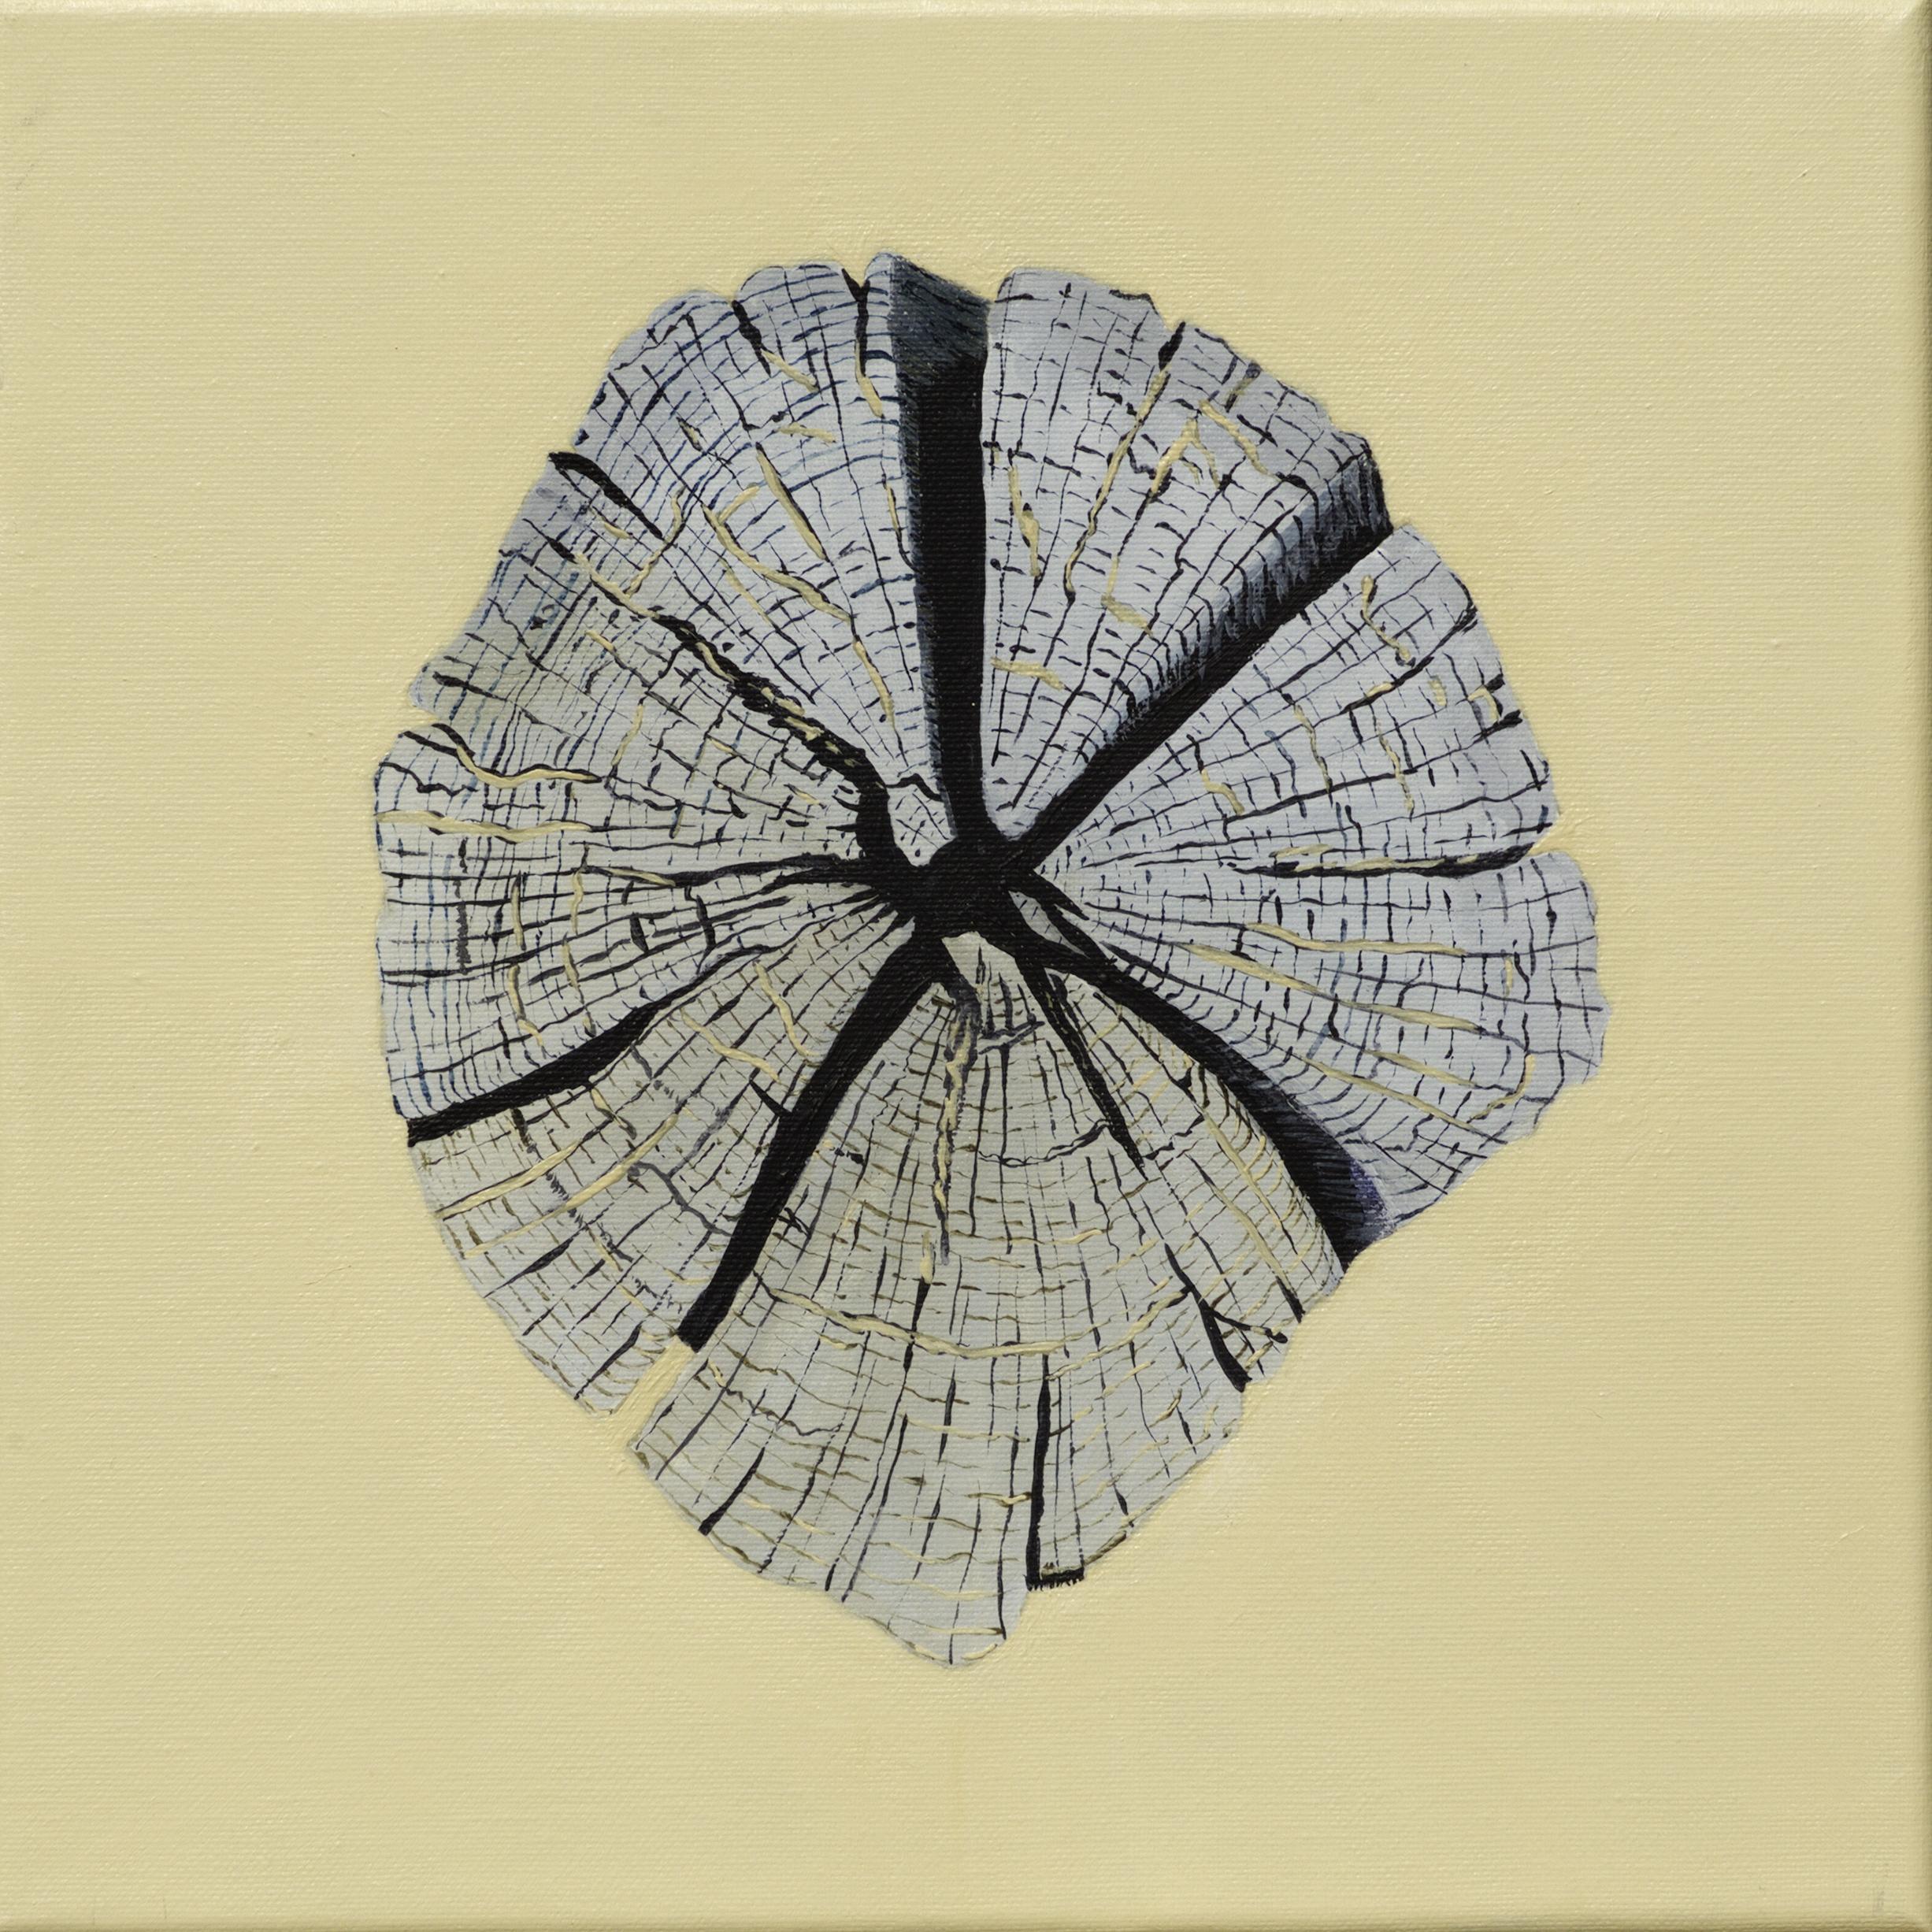 Paalkop 9 - acryl op canvas - 30 x 30 cm